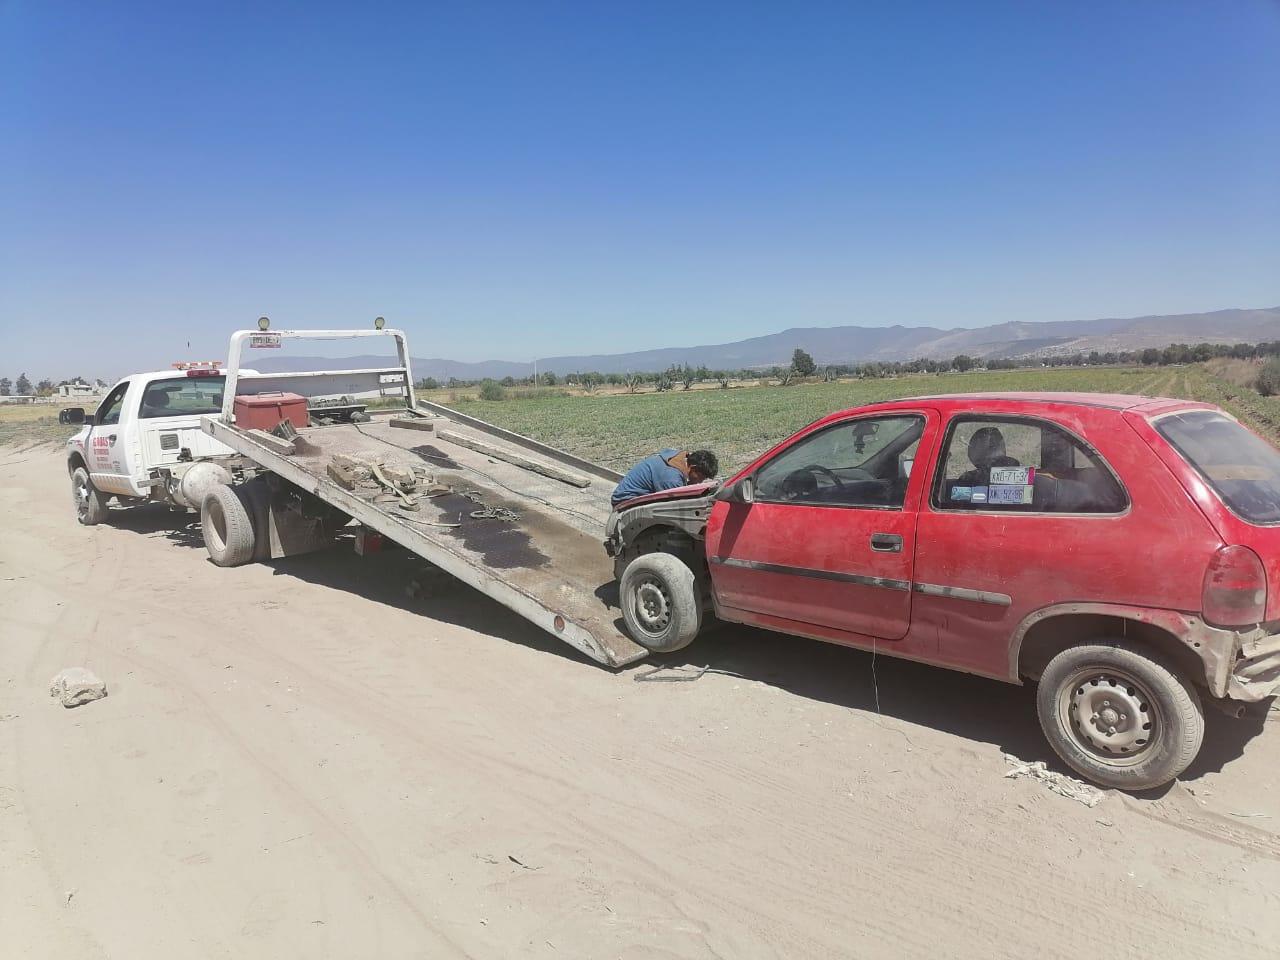 Policías localizan vehículo con reporte de robo en Quecholac